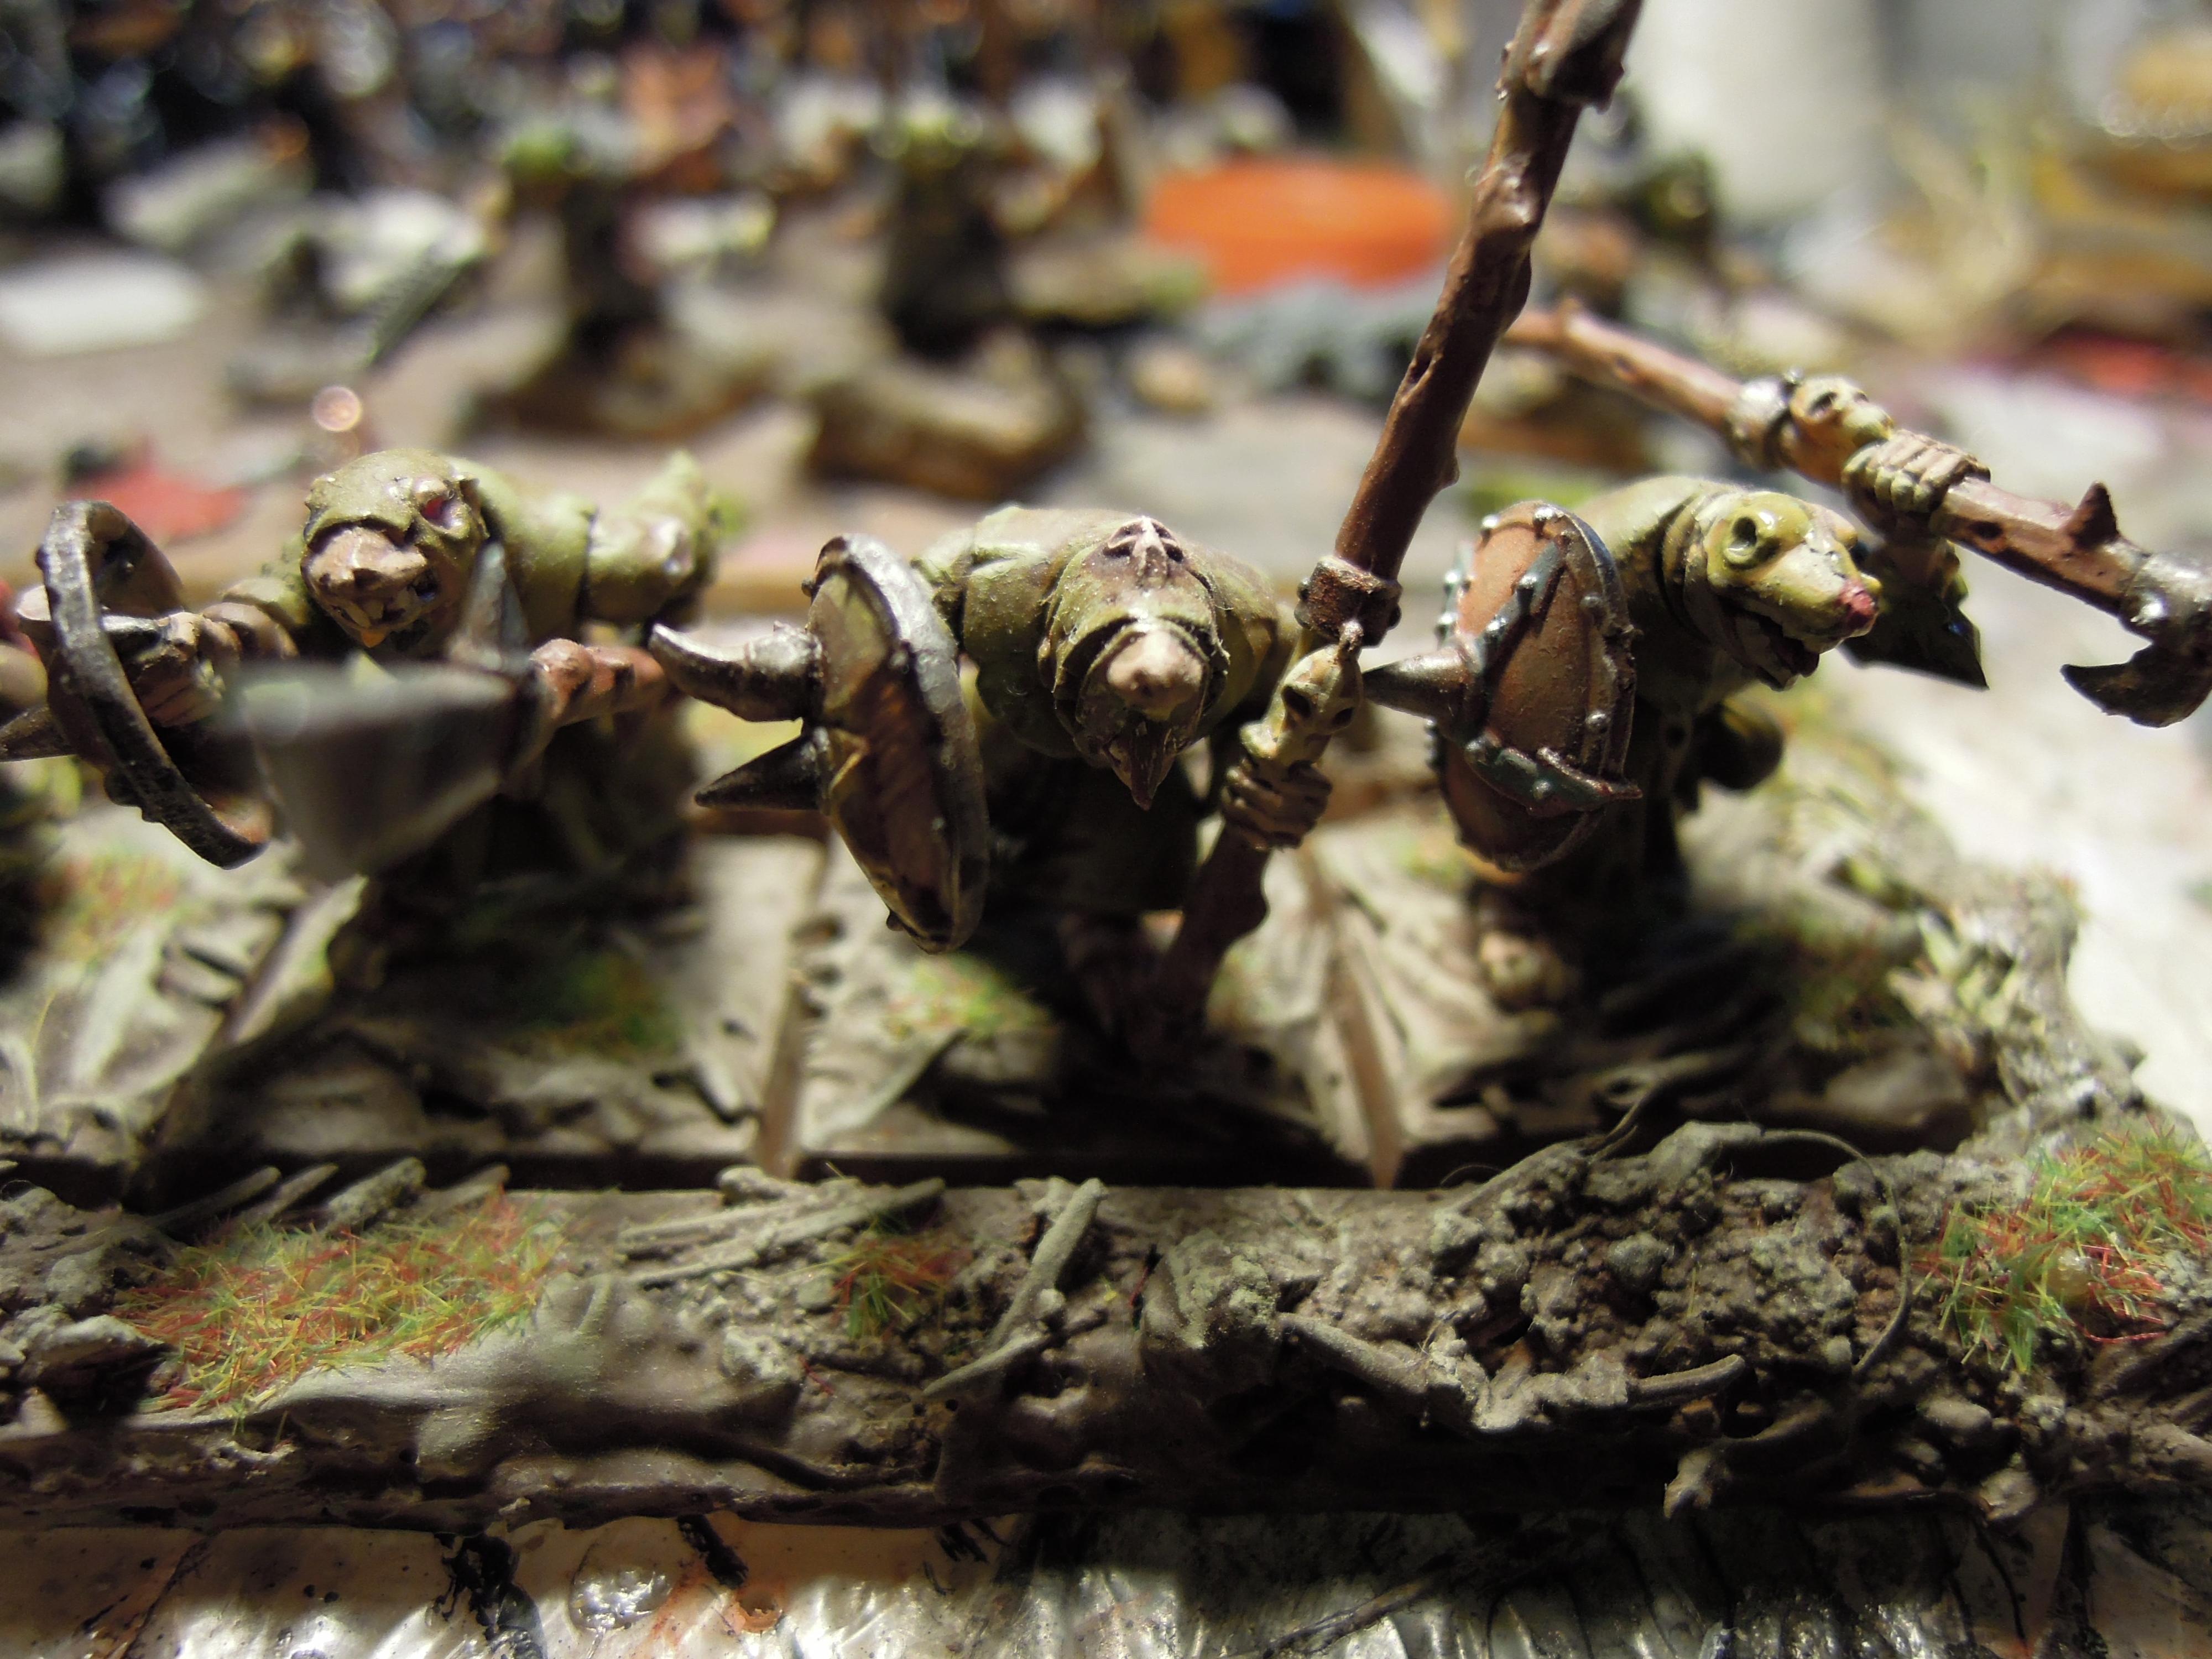 Age Of Sigmar, Chaos, Conversion, Pestilence, Plague, Plague Monks, Rats, Regiment, Shield, Skaven, Spear, Warhammer Fantasy